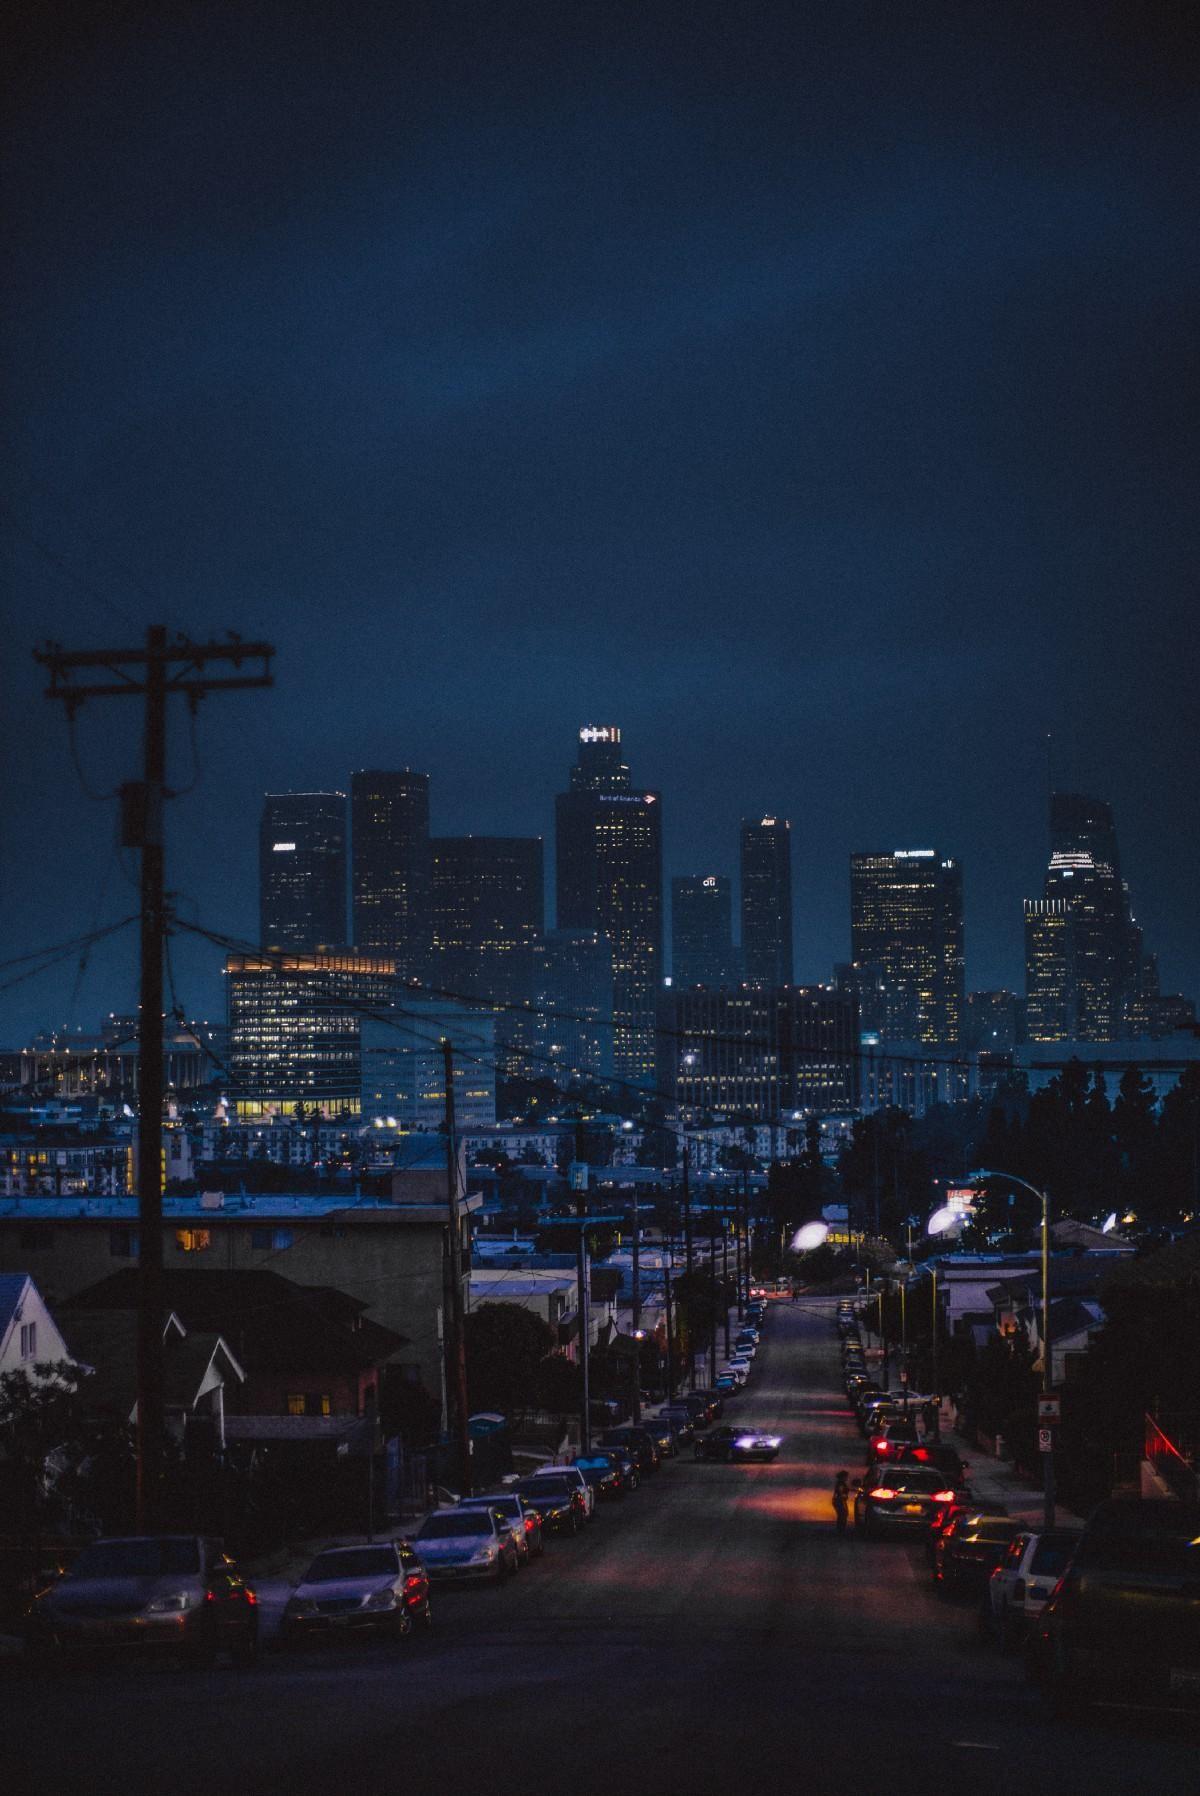 Los Angeles California [1200x1796] Los angeles at night